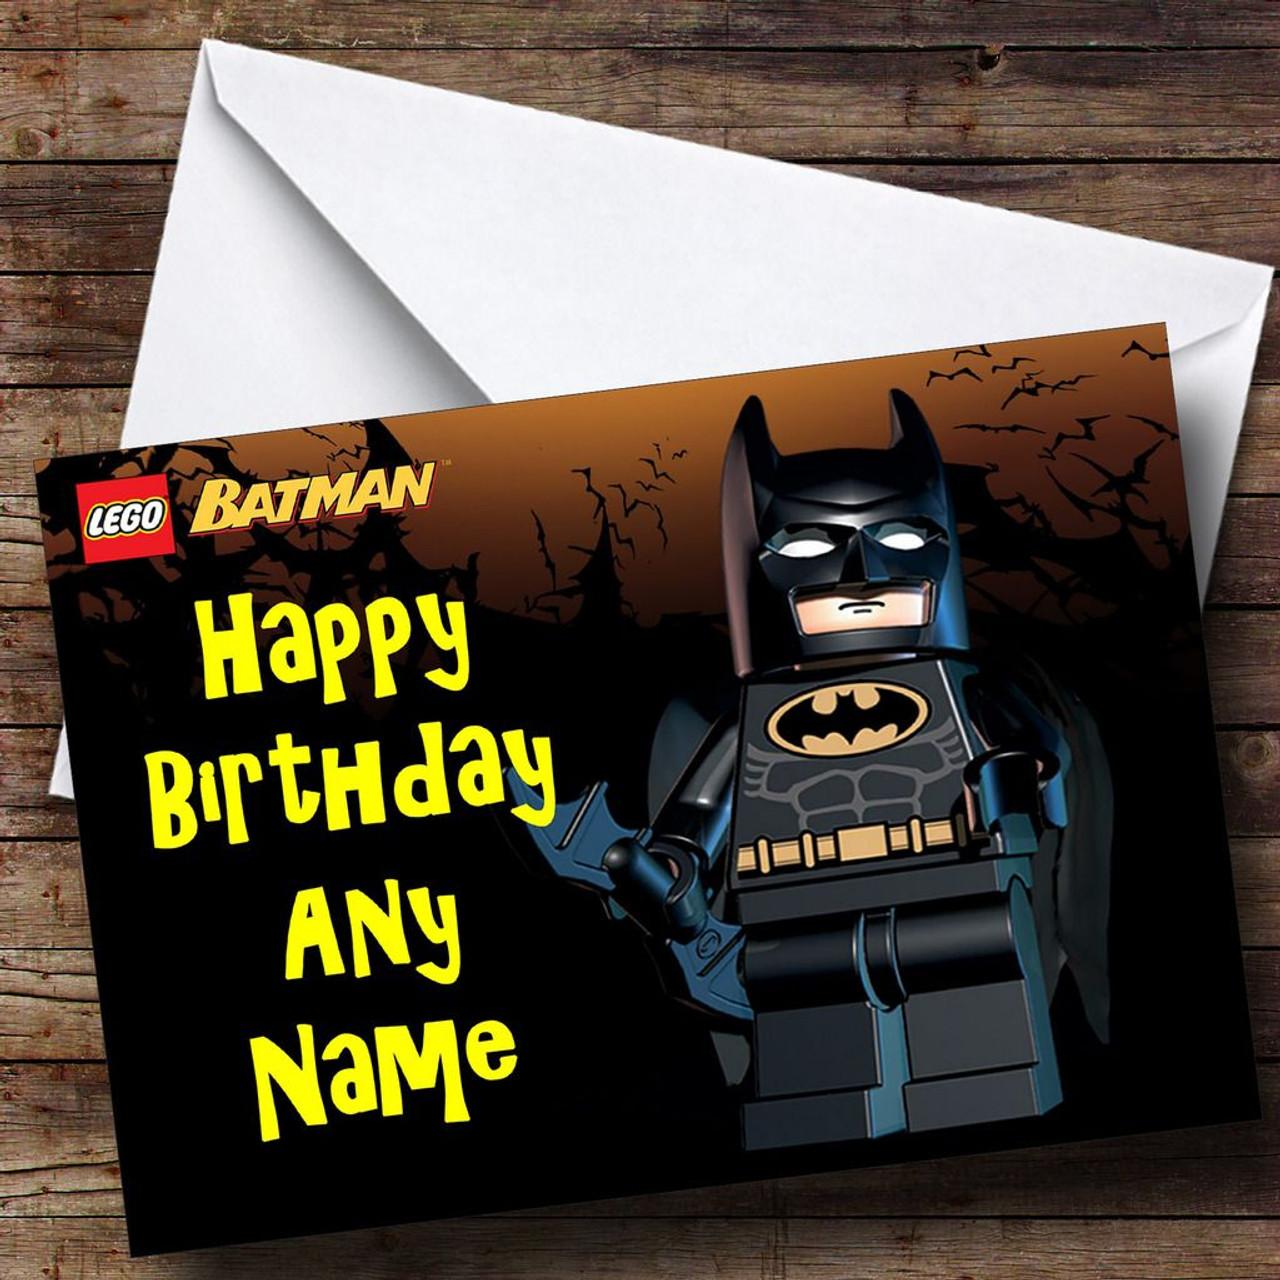 Lego batman personalised birthday card the card zoo lego batman personalised birthday card bookmarktalkfo Choice Image